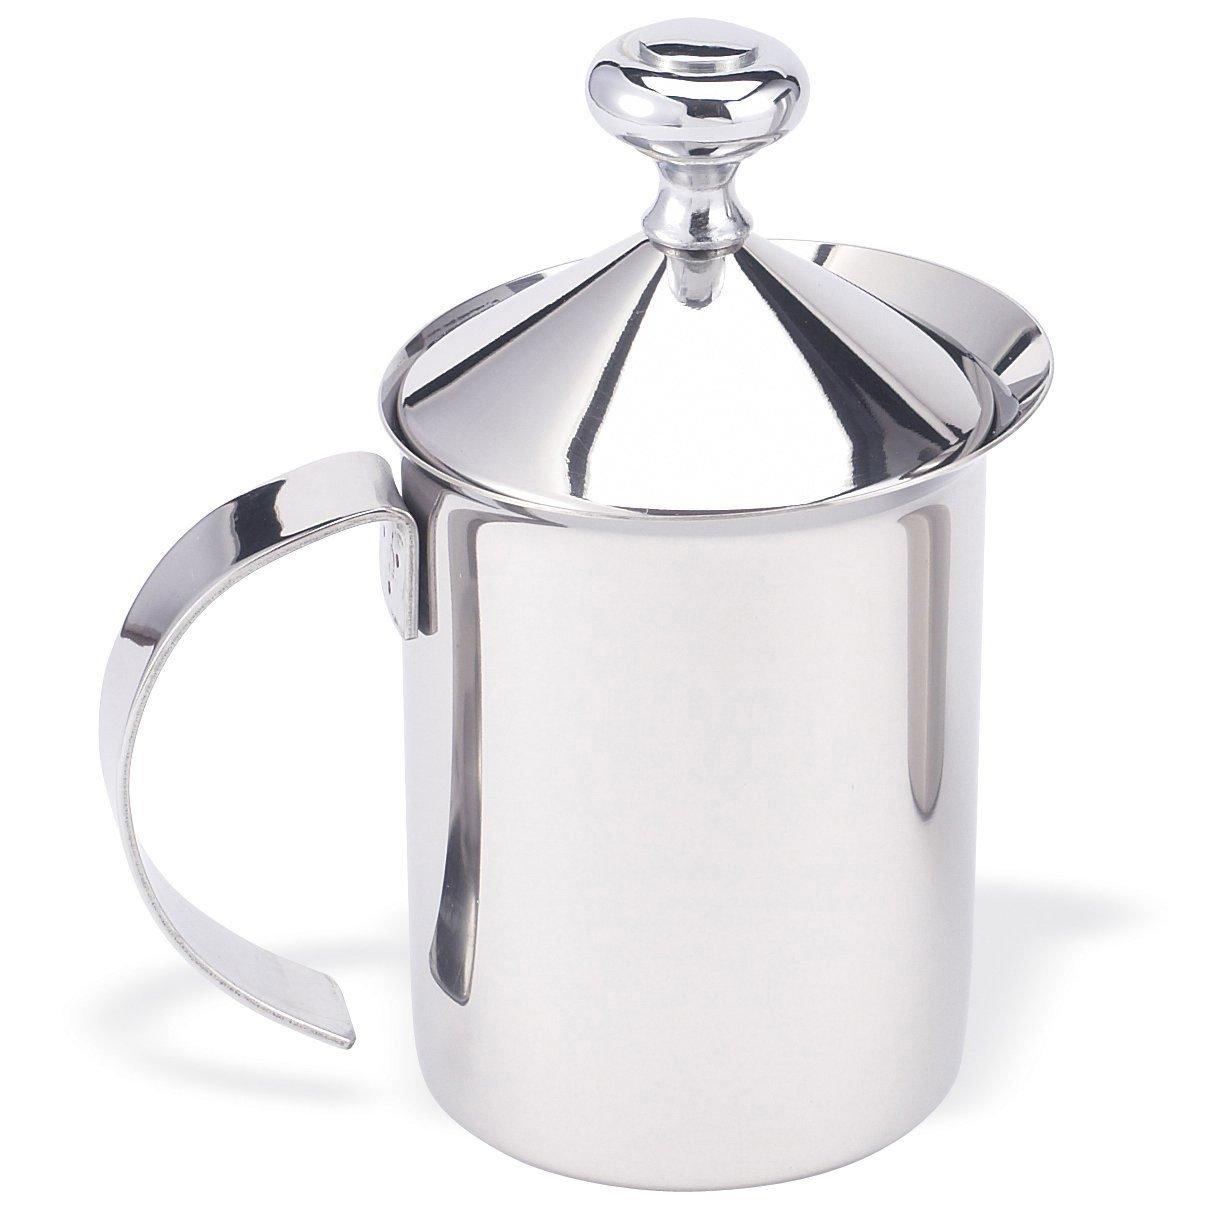 Cuisinox 800ml Hand Pump Cappuccino/Milk Frother